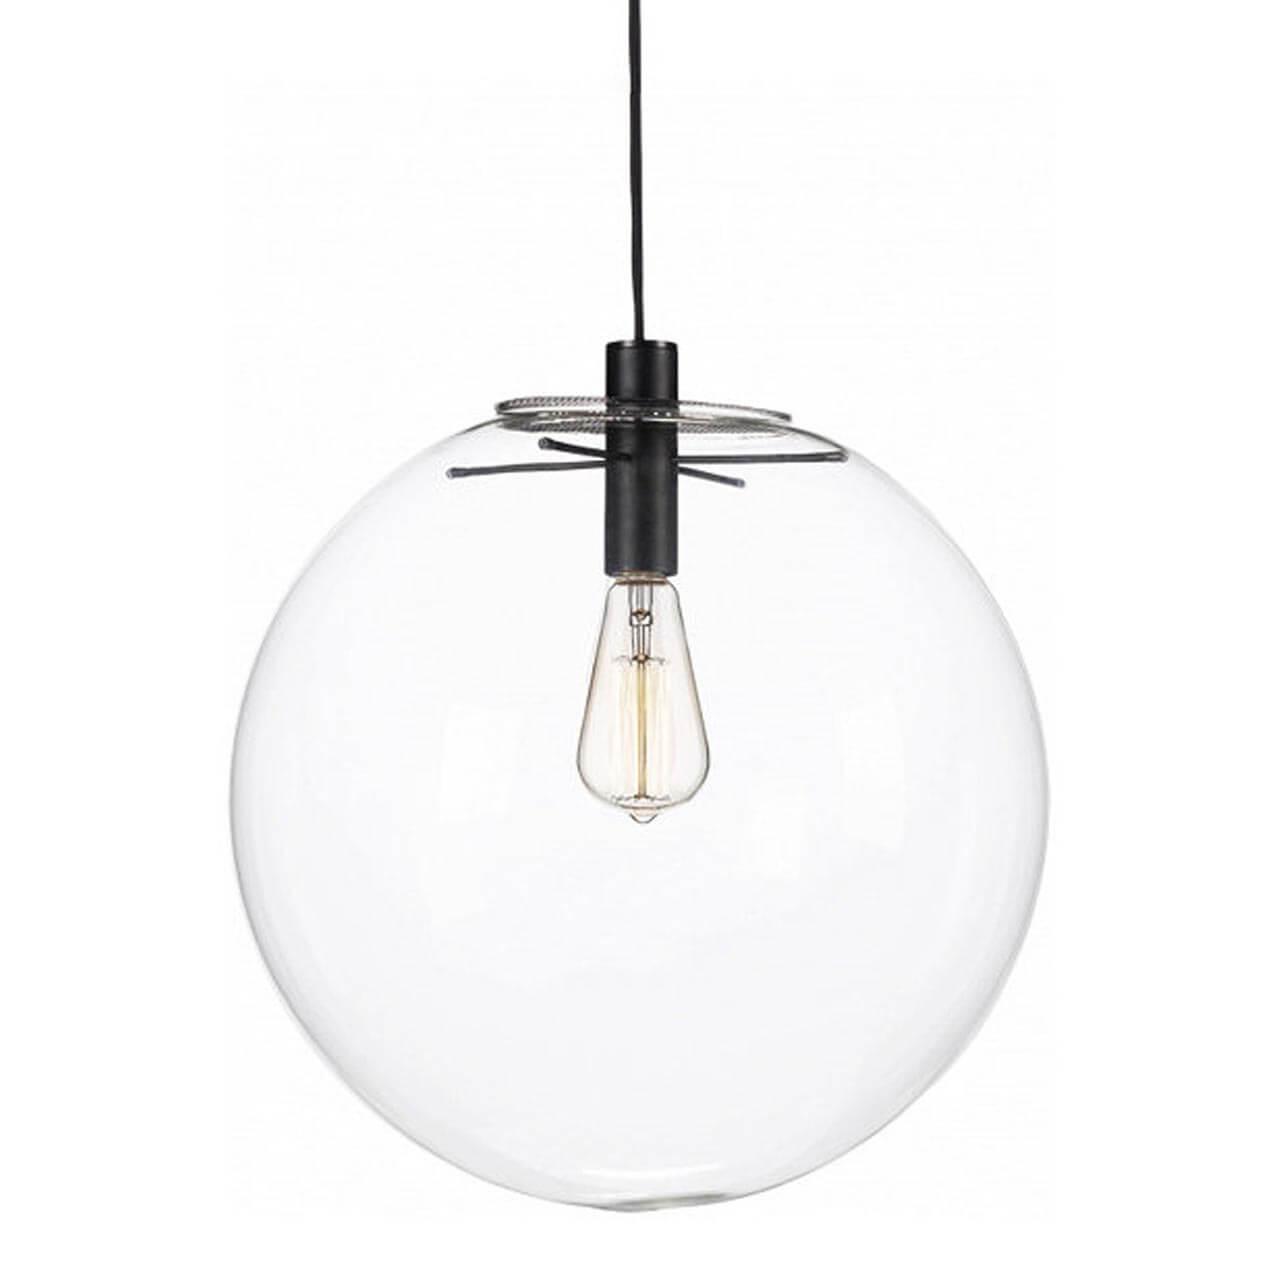 цена на Светильник Kink Light 07562-30,21 Меркурий